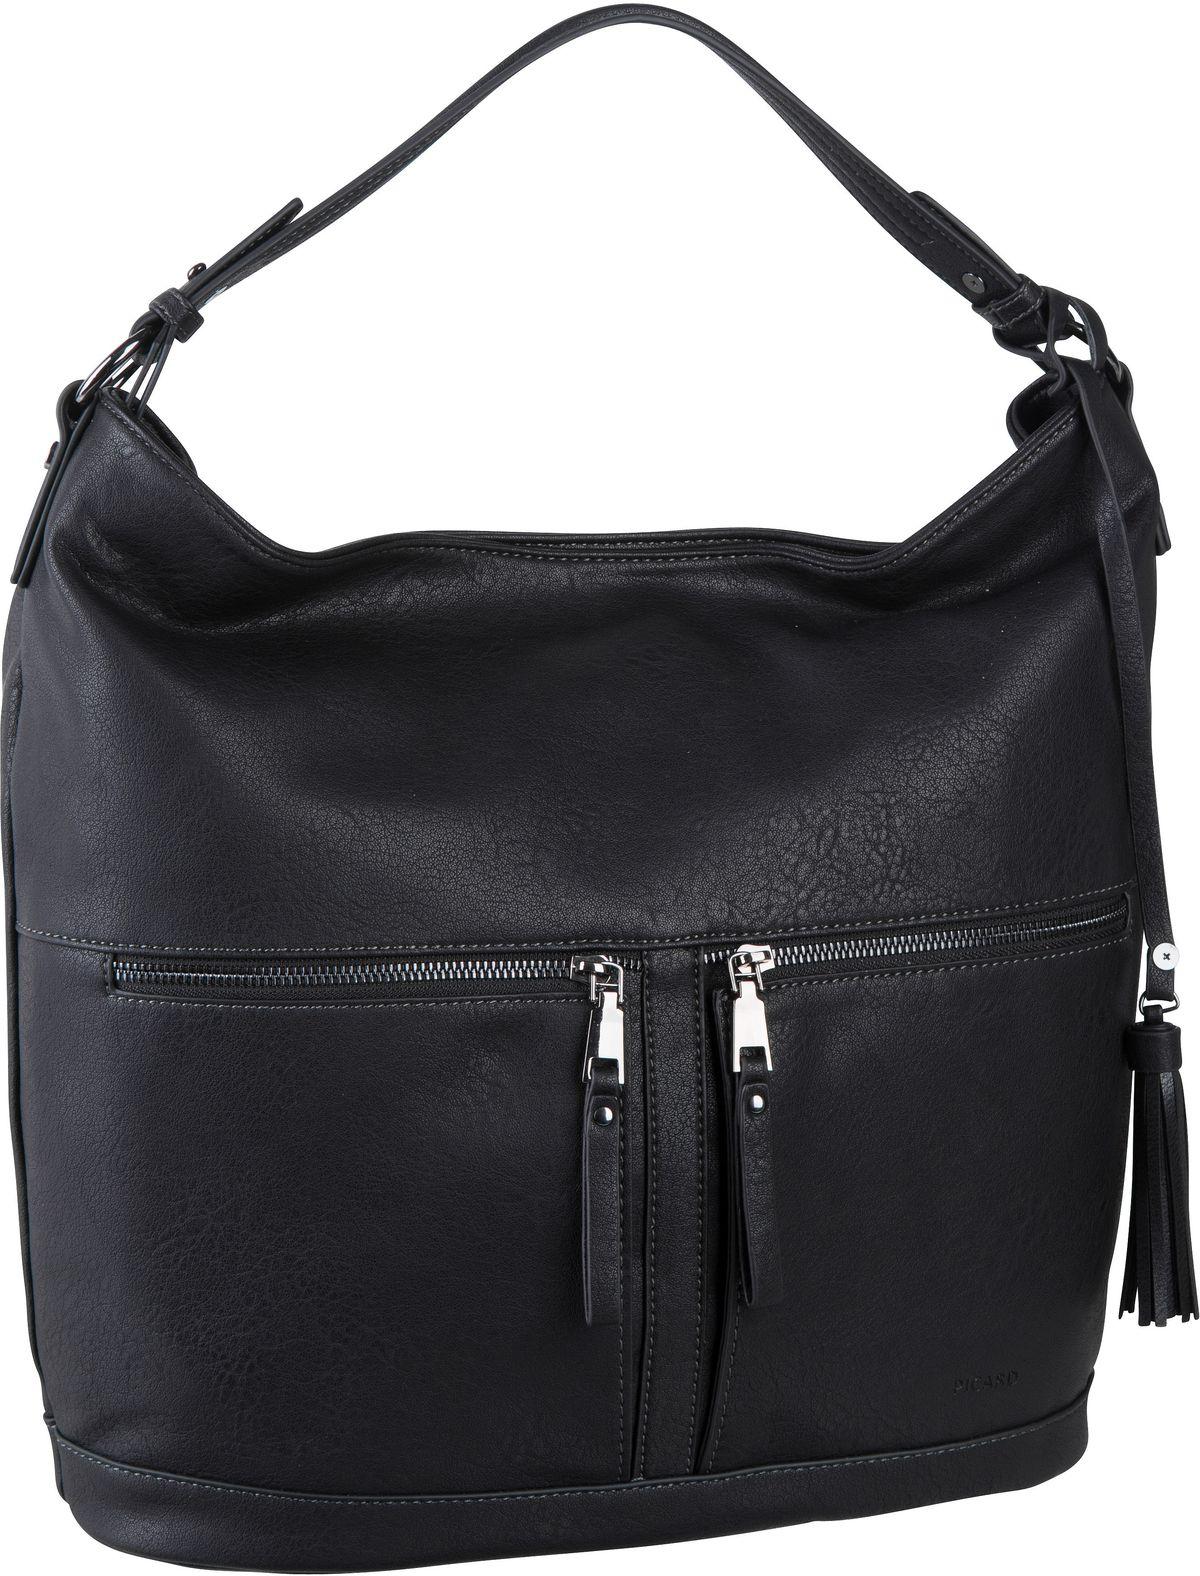 Handtasche Mellow 2742 Schwarz